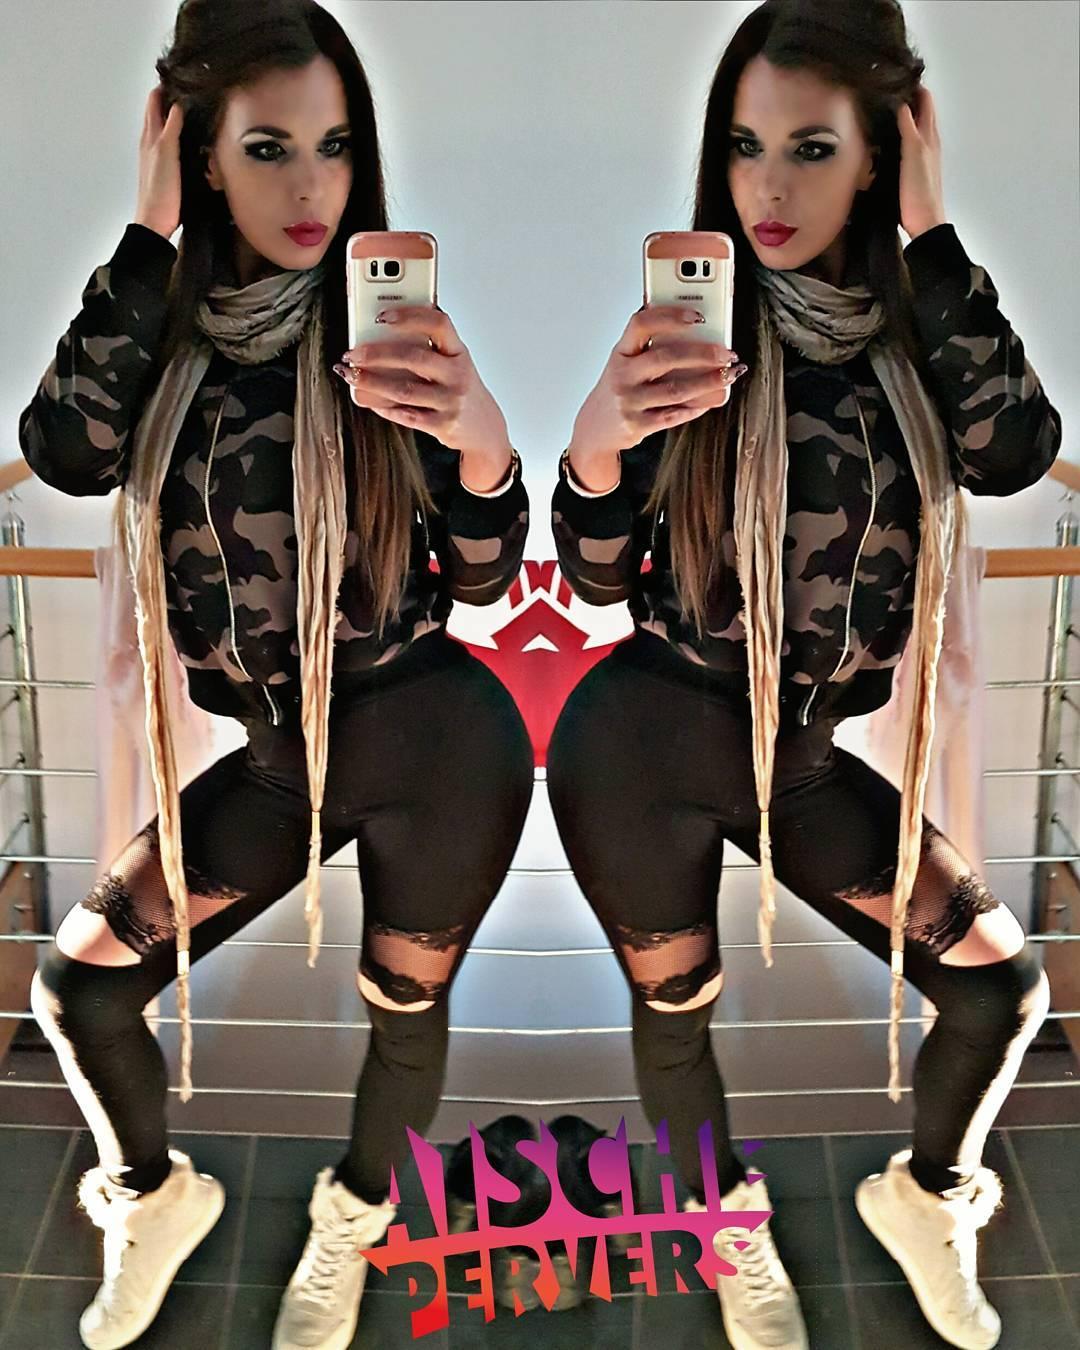 Auch angezogen hab ich ne dicke Kiste 🍑🍑🍑 Früher wollten alle Titten….nun wollen alle Arsch:) I ❤ my booty! #model #modellife #fitness #fit #healthy #sport #workout #motivation #mcfit #madebymcfit #booty #big #butt  #bigbutt #ass #legdayproblems #legs #legday #leggings #gucci #shoes #camouflage #outfitoftheday #outfit #bemyvalentine